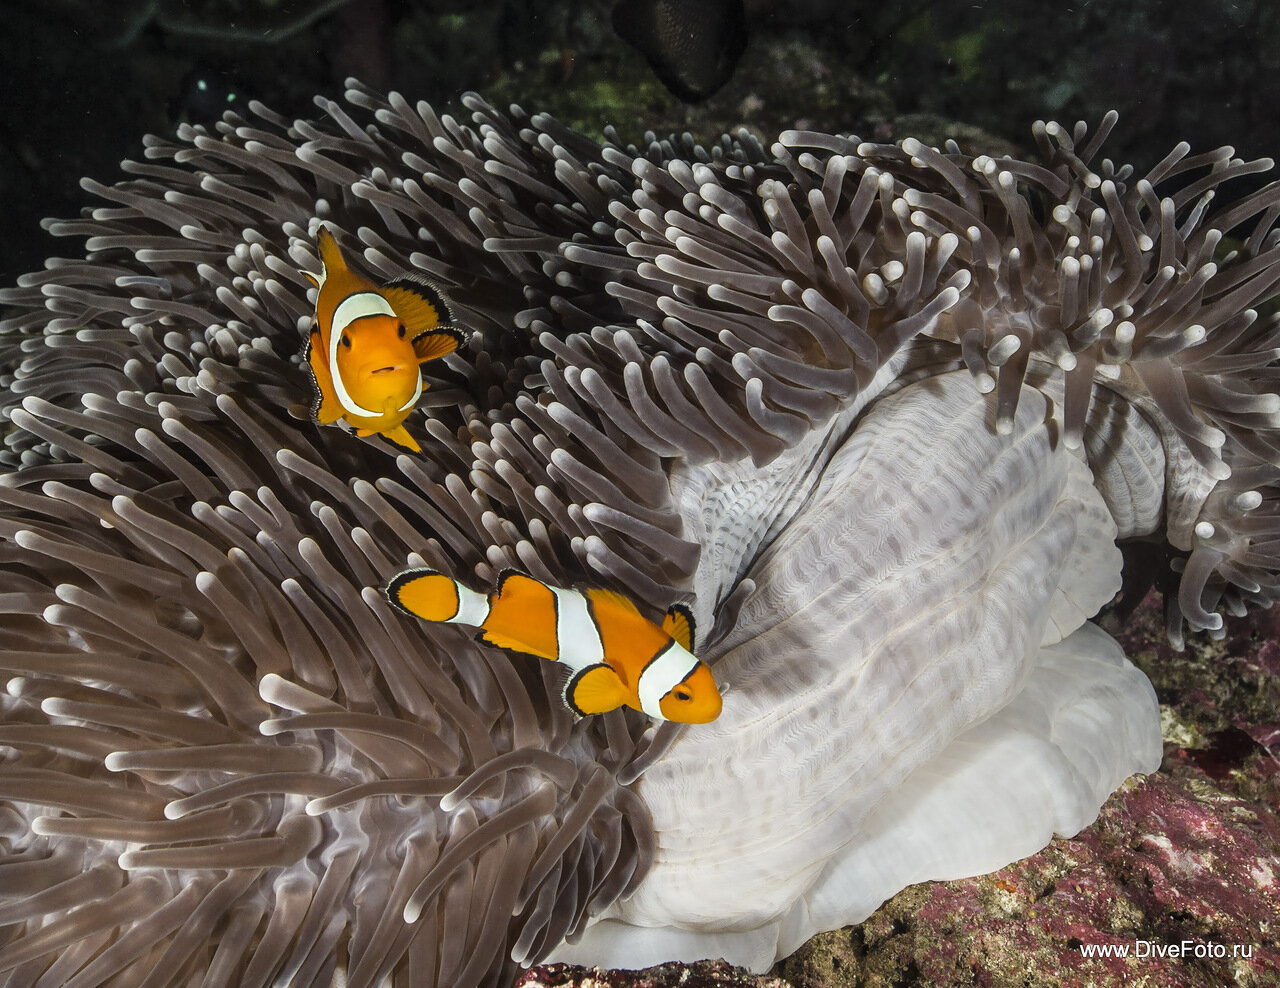 Западная рыба клоун (Немо) фото